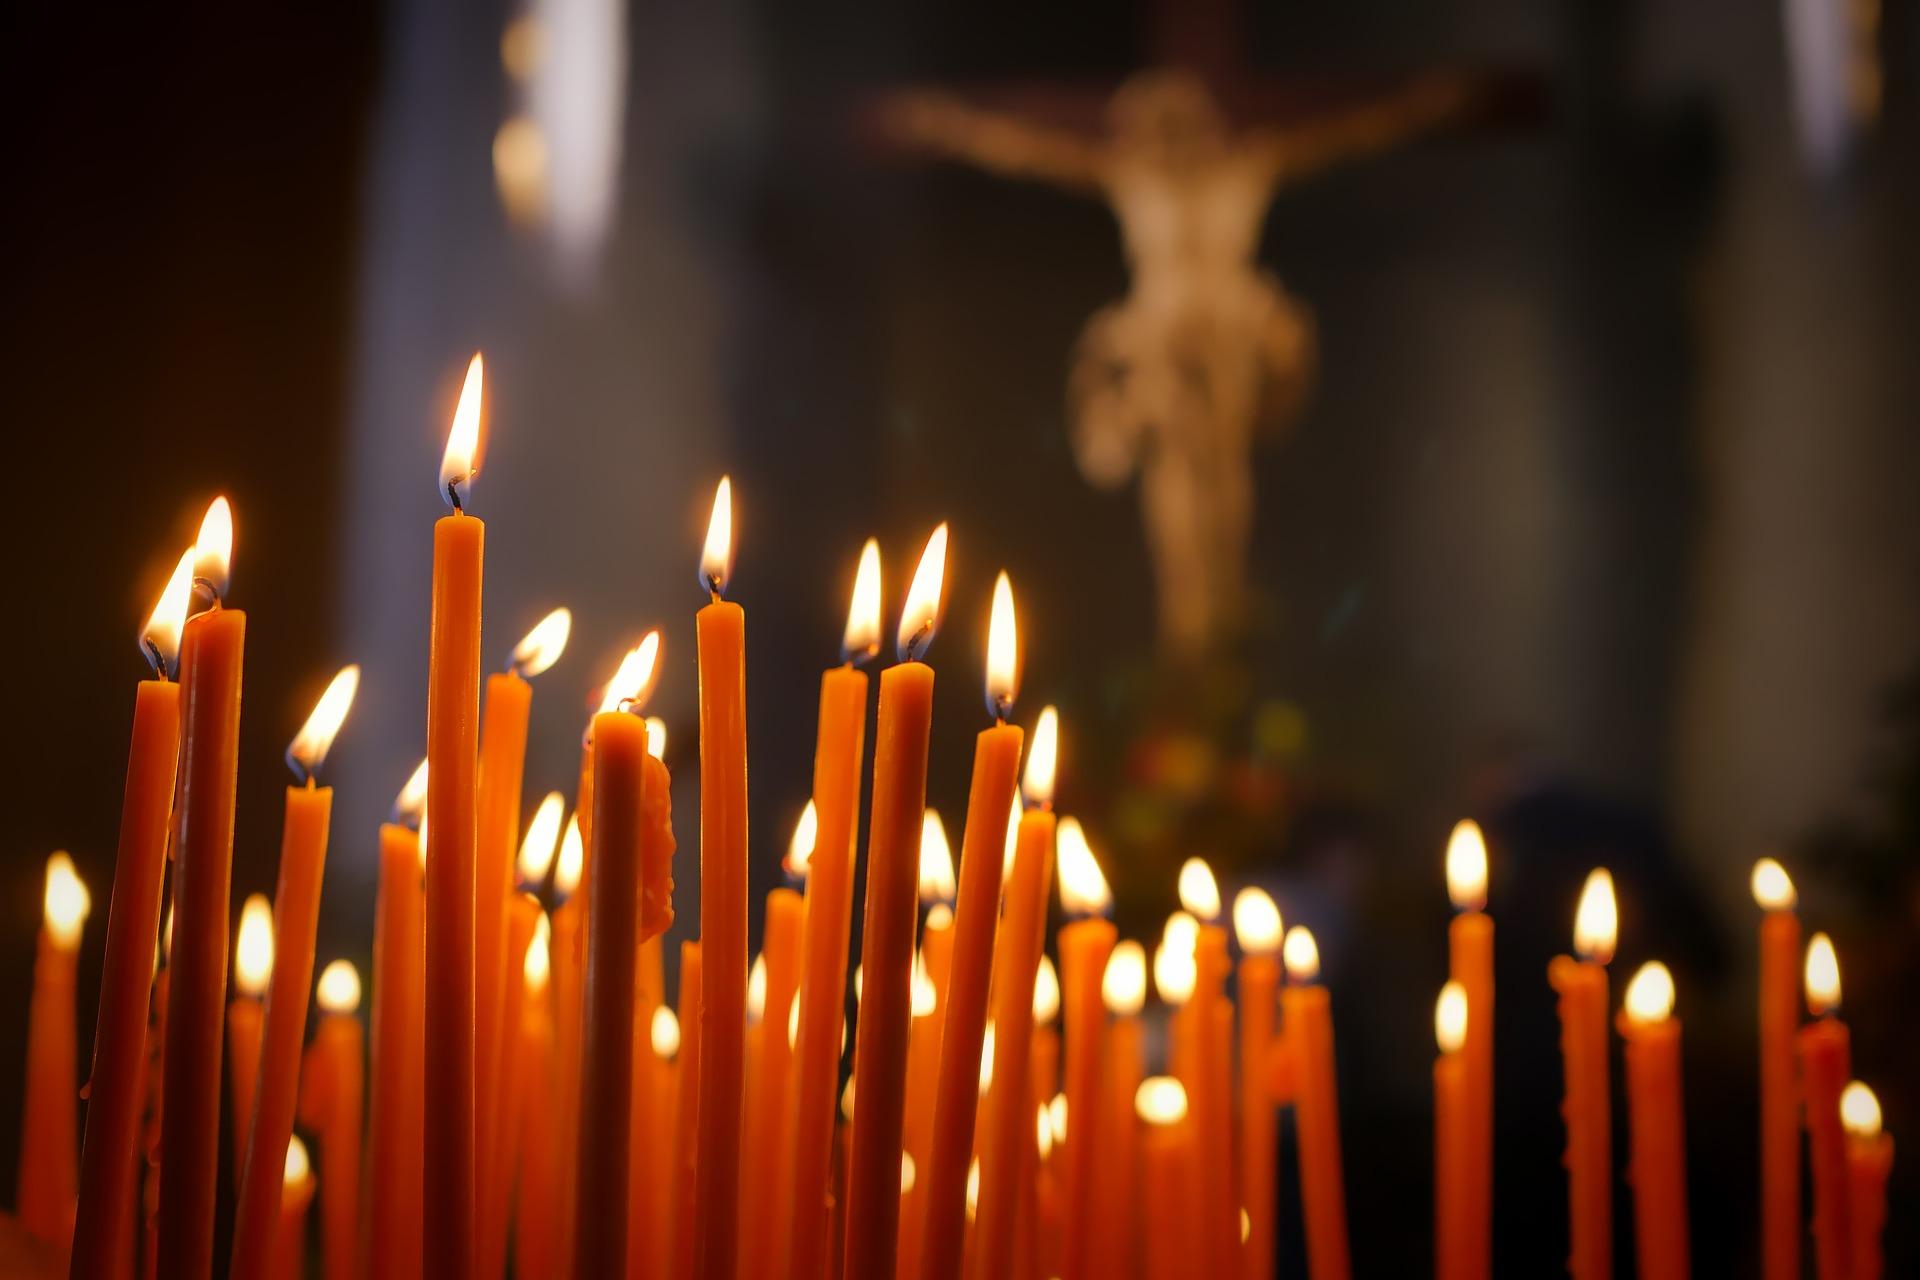 candles-2903063_1920.jpg